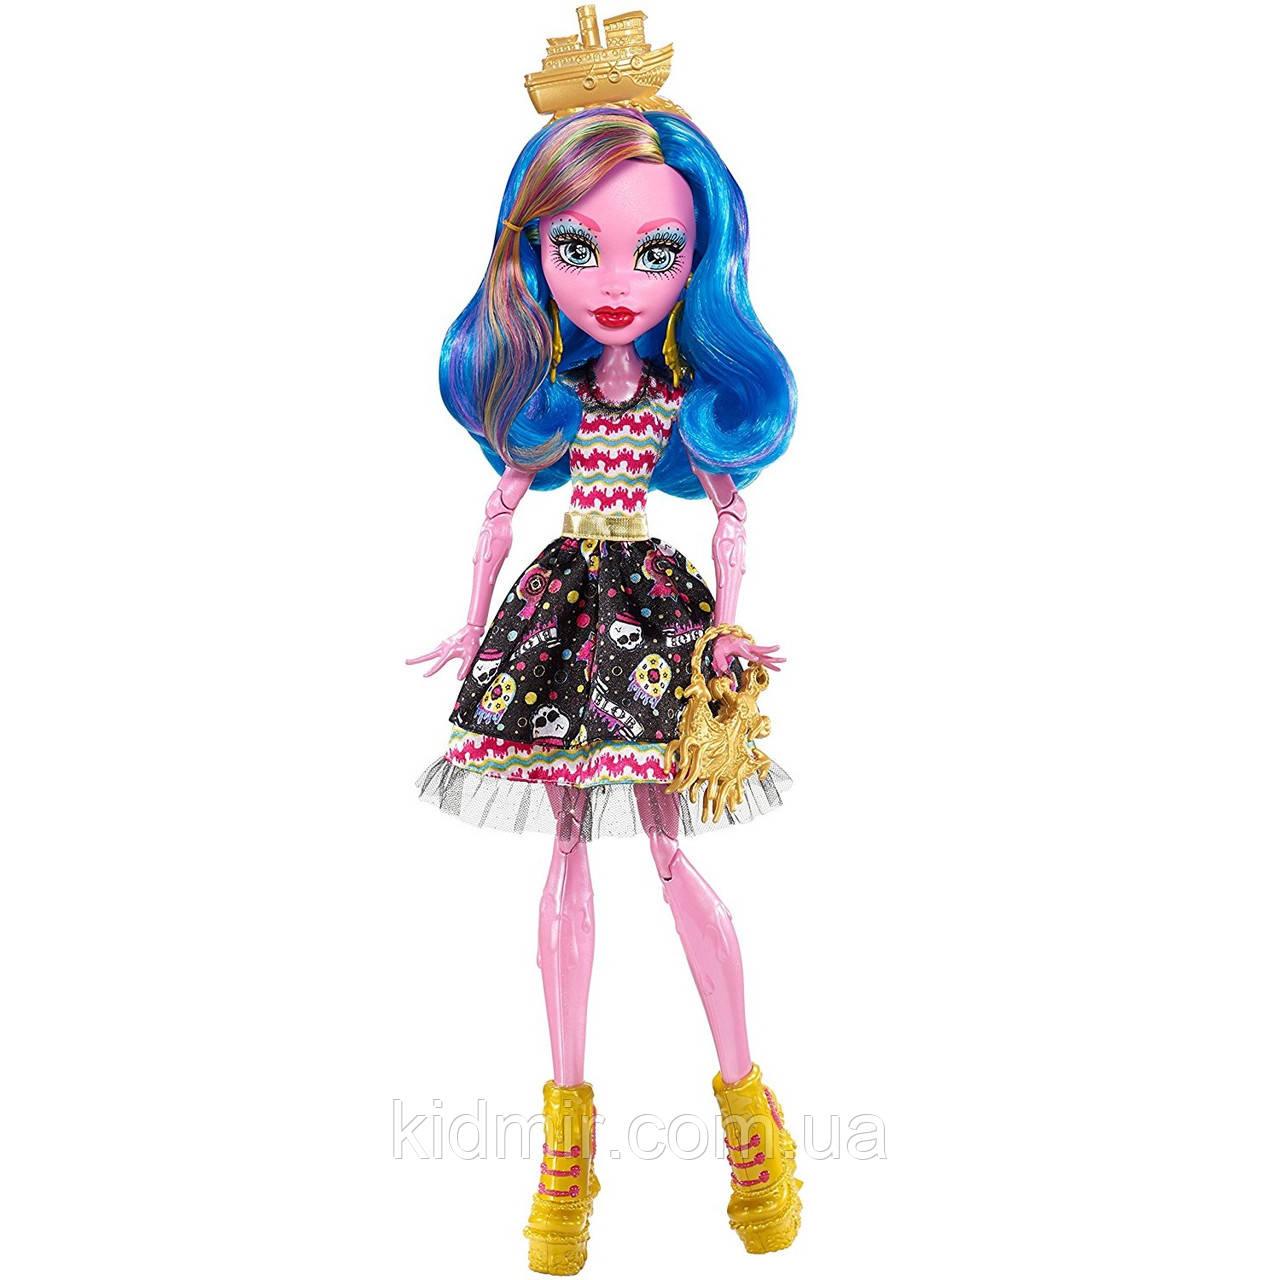 Кукла Monster High Гулиопа Джеллингтон Gooliope Jellington Shriek Wrecked Монстр Хай